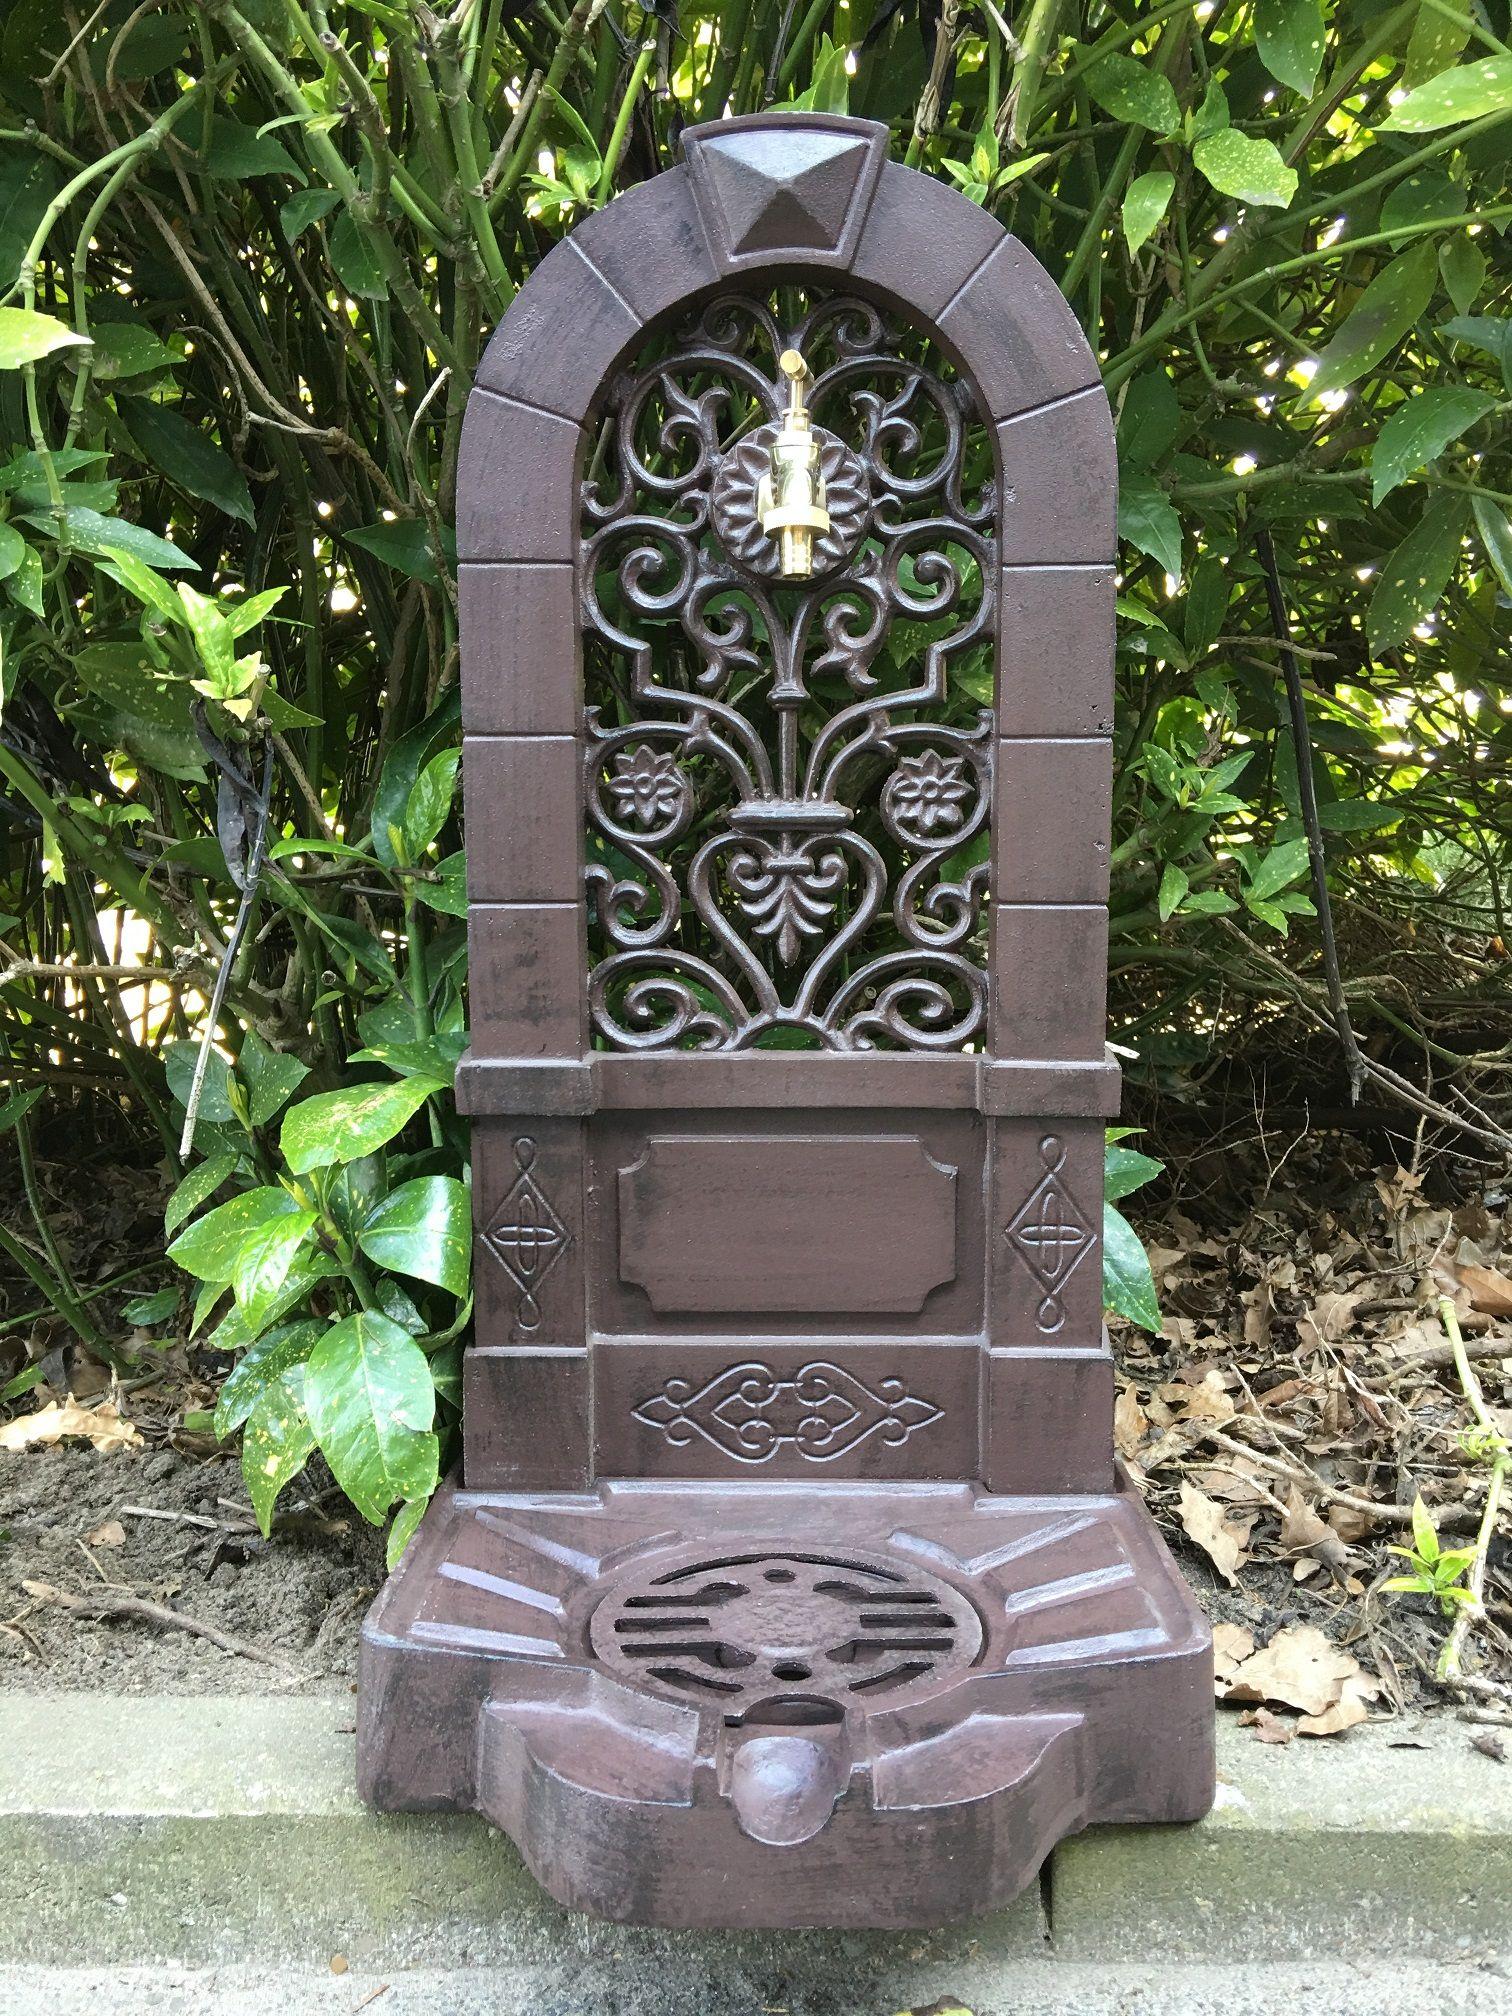 Tuin Ornament Fontein.Tags Tuin Fonteinen Muur Fonteinen Rond De Eeuwwisseling In Landelijke Stijl Art Nouveau Water Water Dispenser Kraan Fontein Kraan